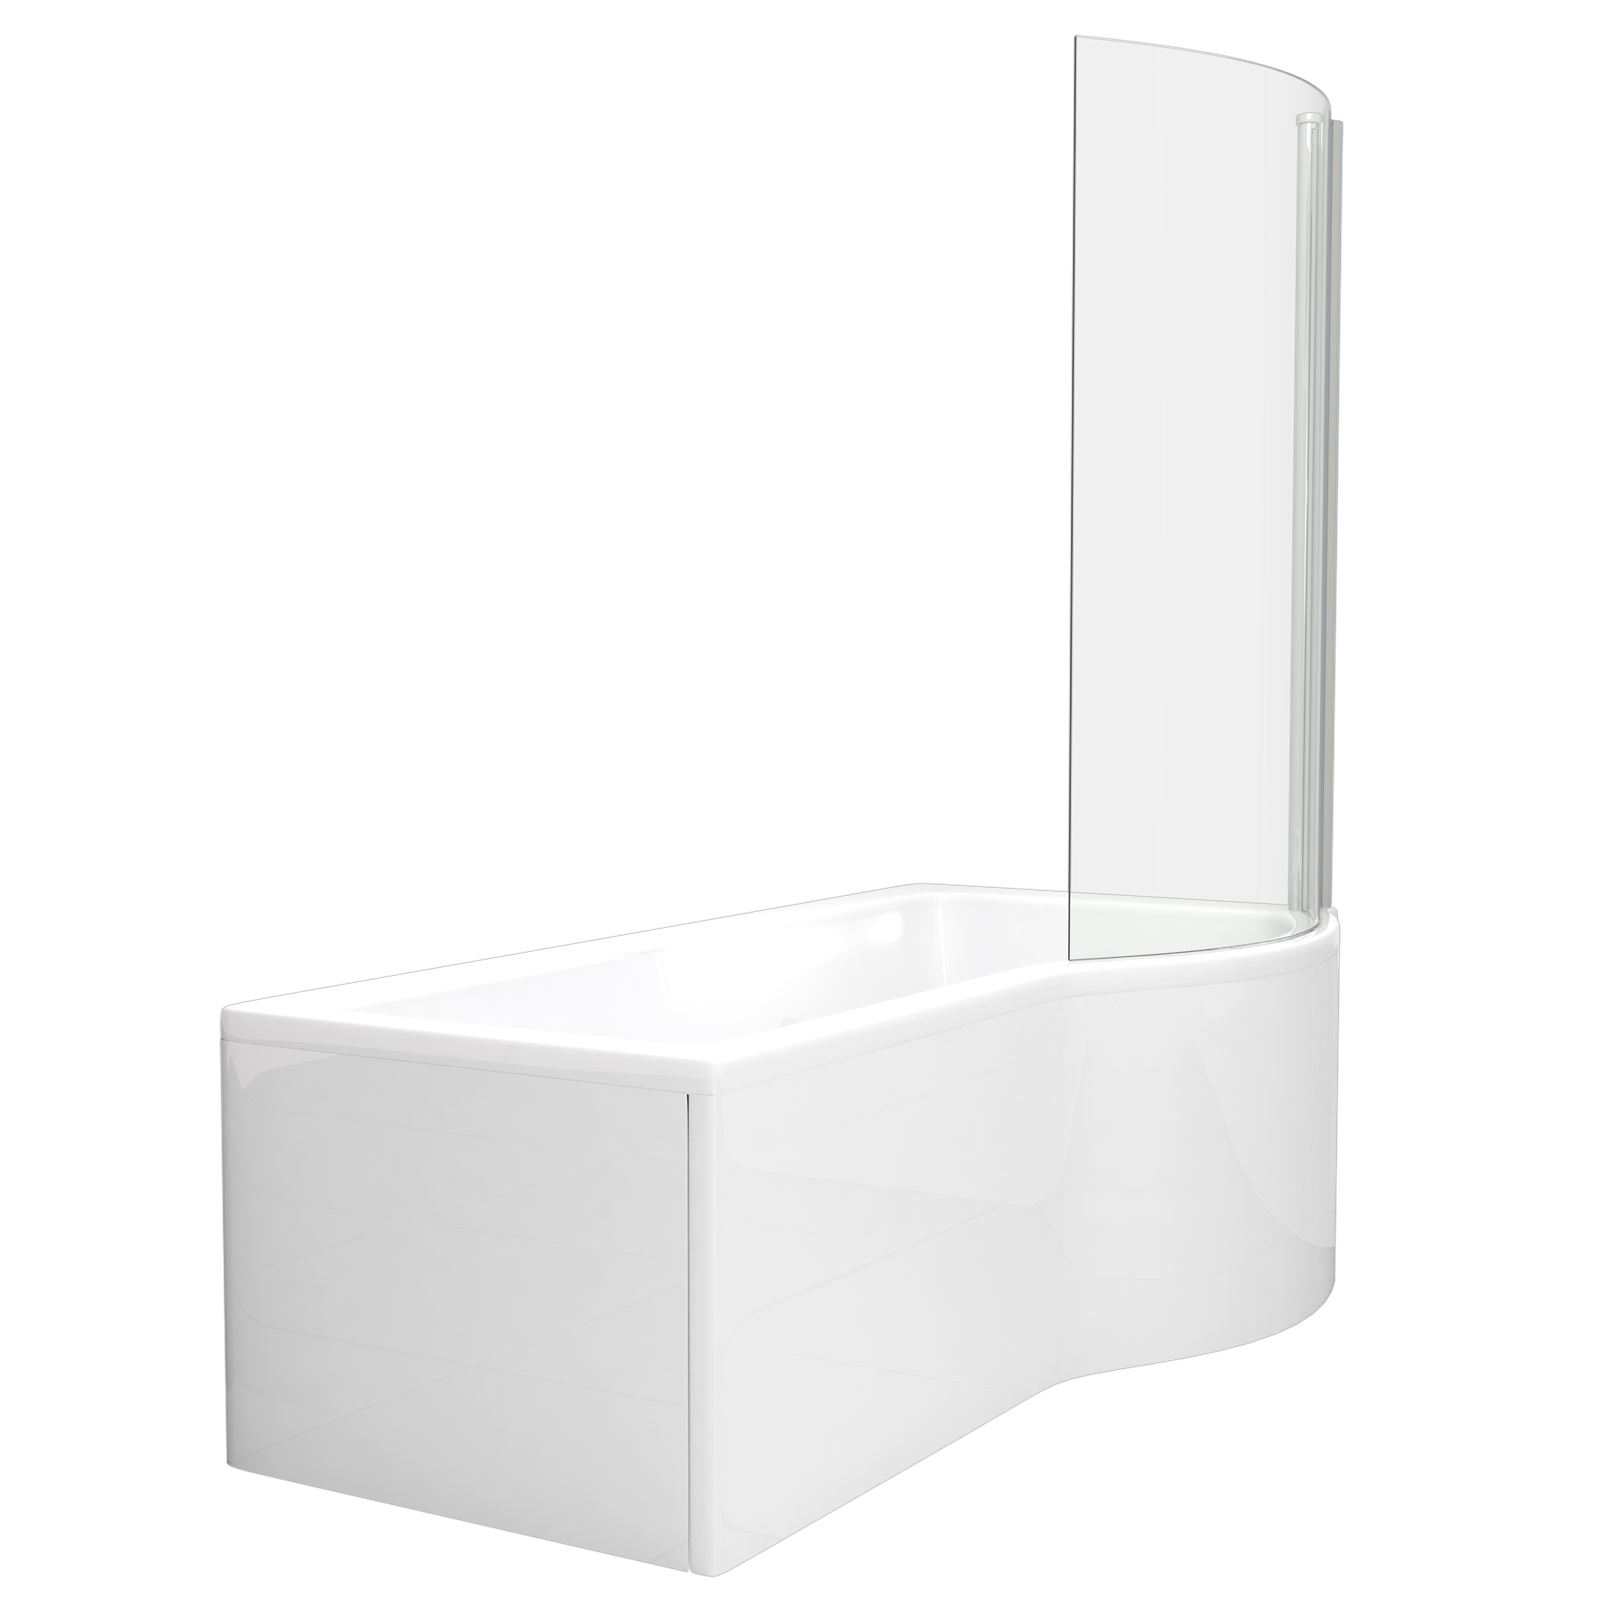 1700 shower bath side panel boston essen shower bath side panel trojan